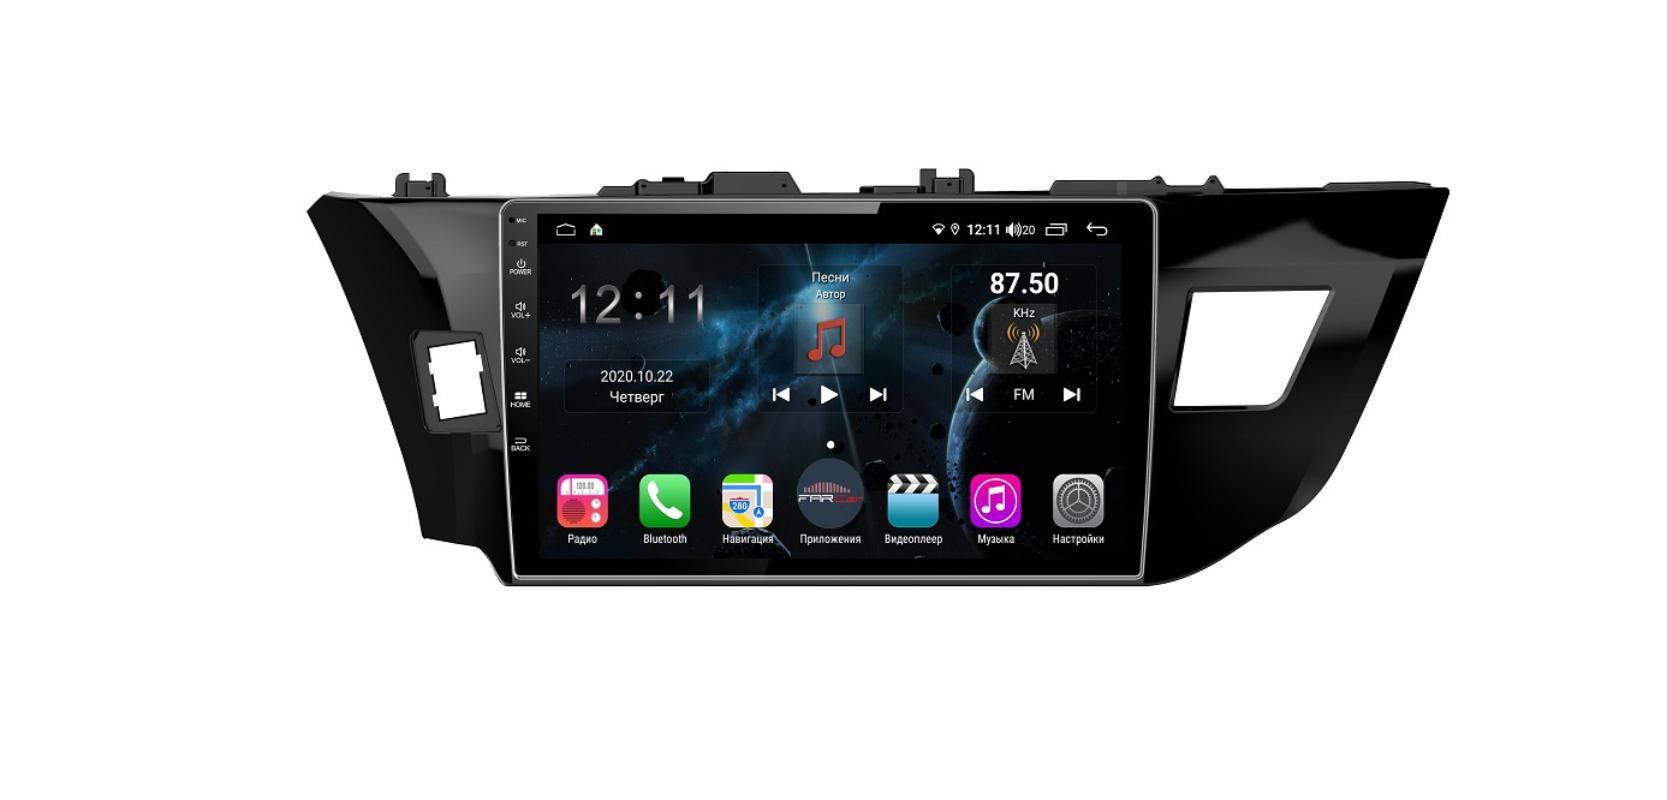 Штатная магнитола FarCar s400 для Toyota Corolla на Android (TG307R) (+ Камера заднего вида в подарок!)